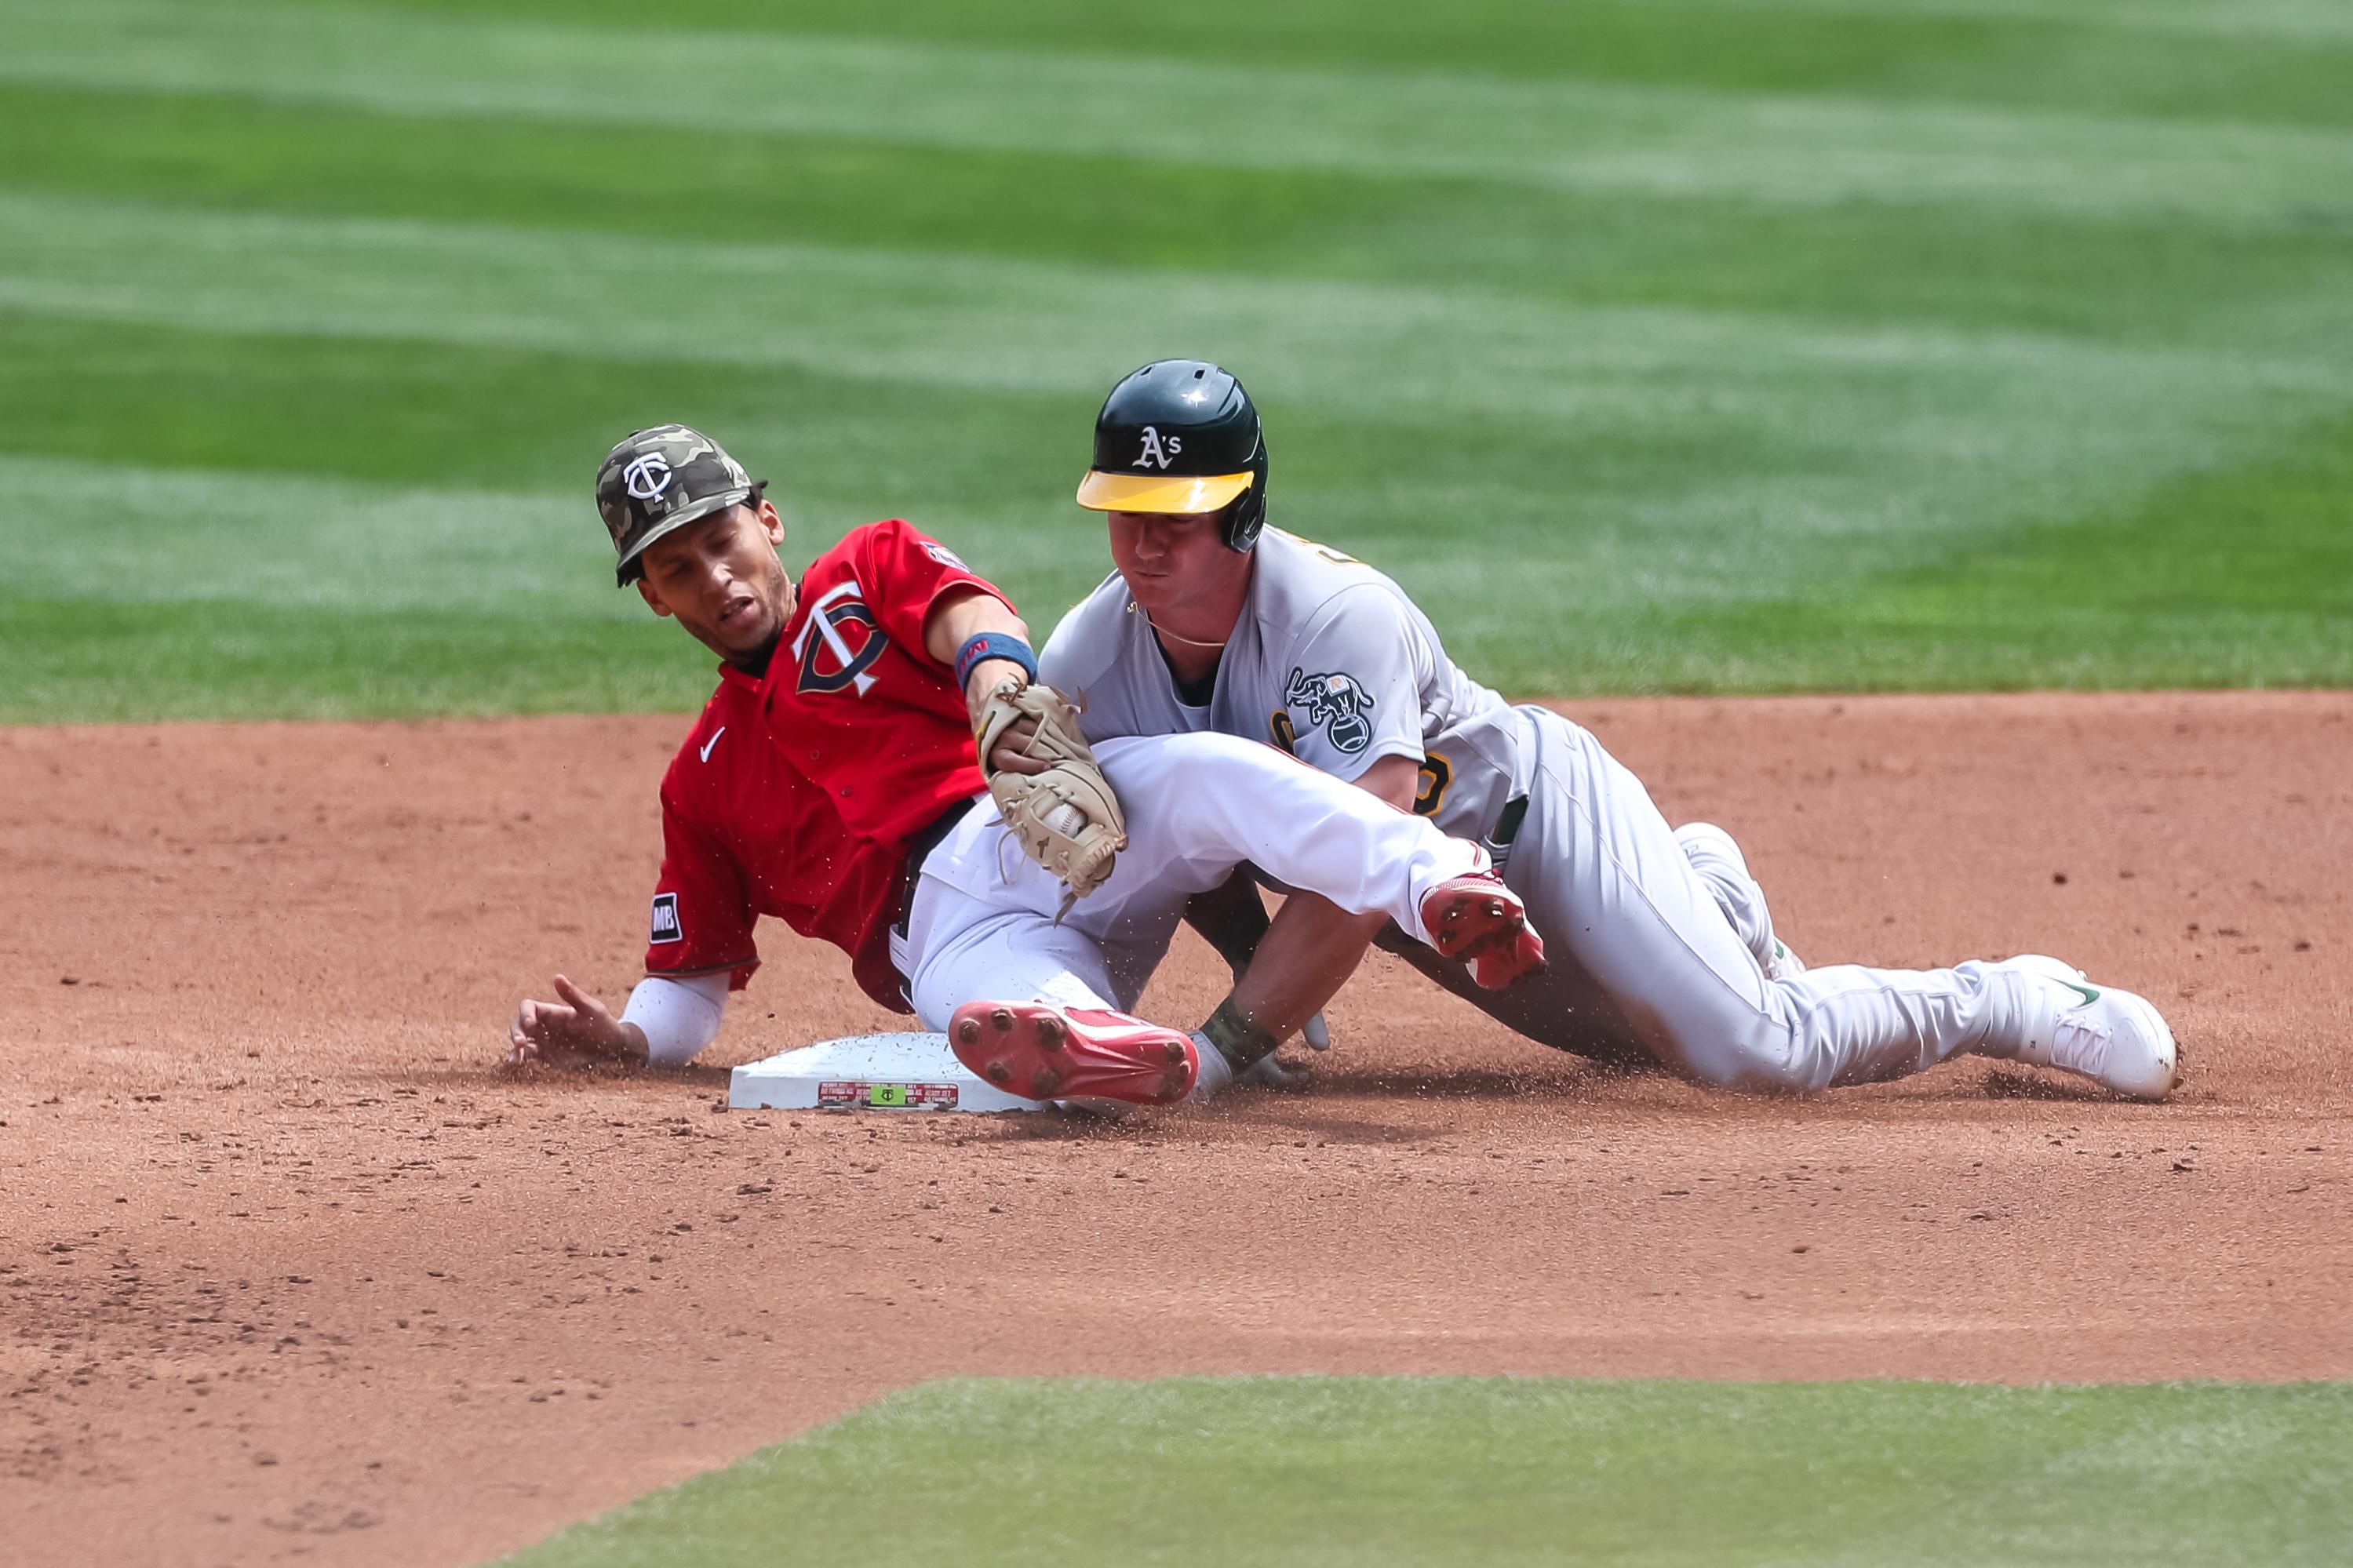 MLB: Oakland Athletics at Minnesota Twins